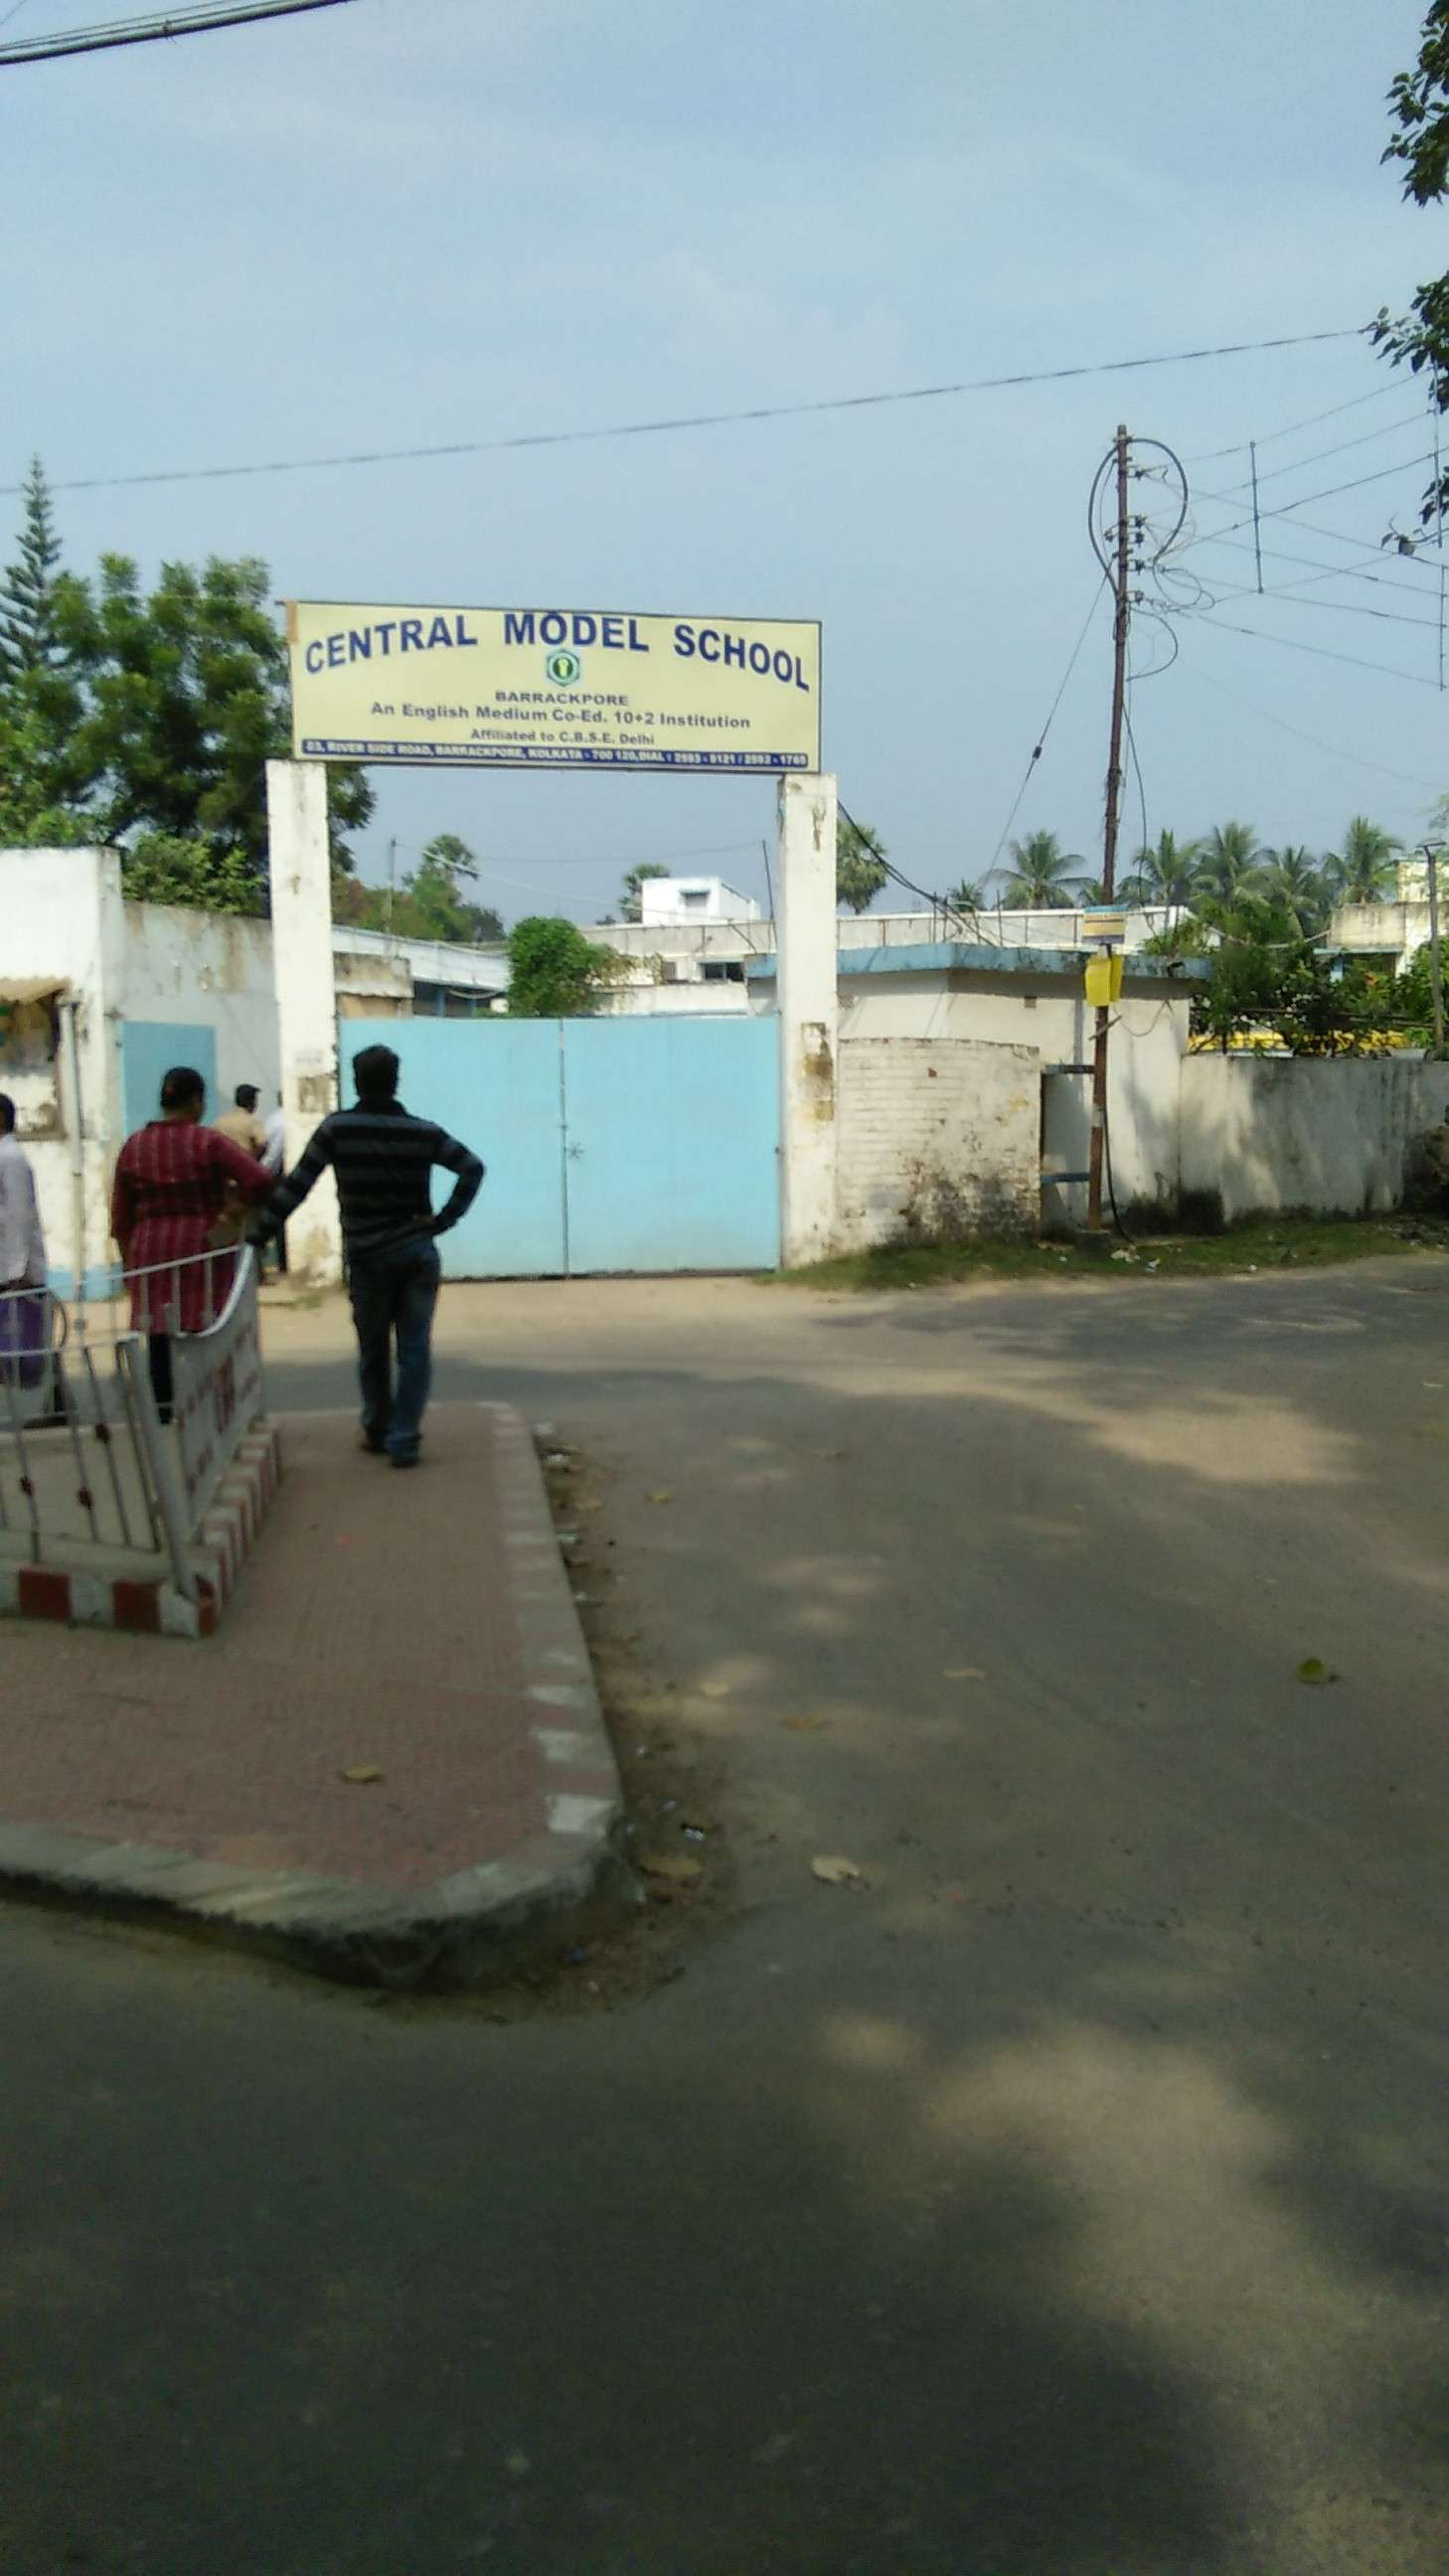 CENTRAL MODEL SCHOOL 23 RIVER SIDE ROAD BARRACKPORE 24 PARGANAS NORTH WEST BENGAL 2430051